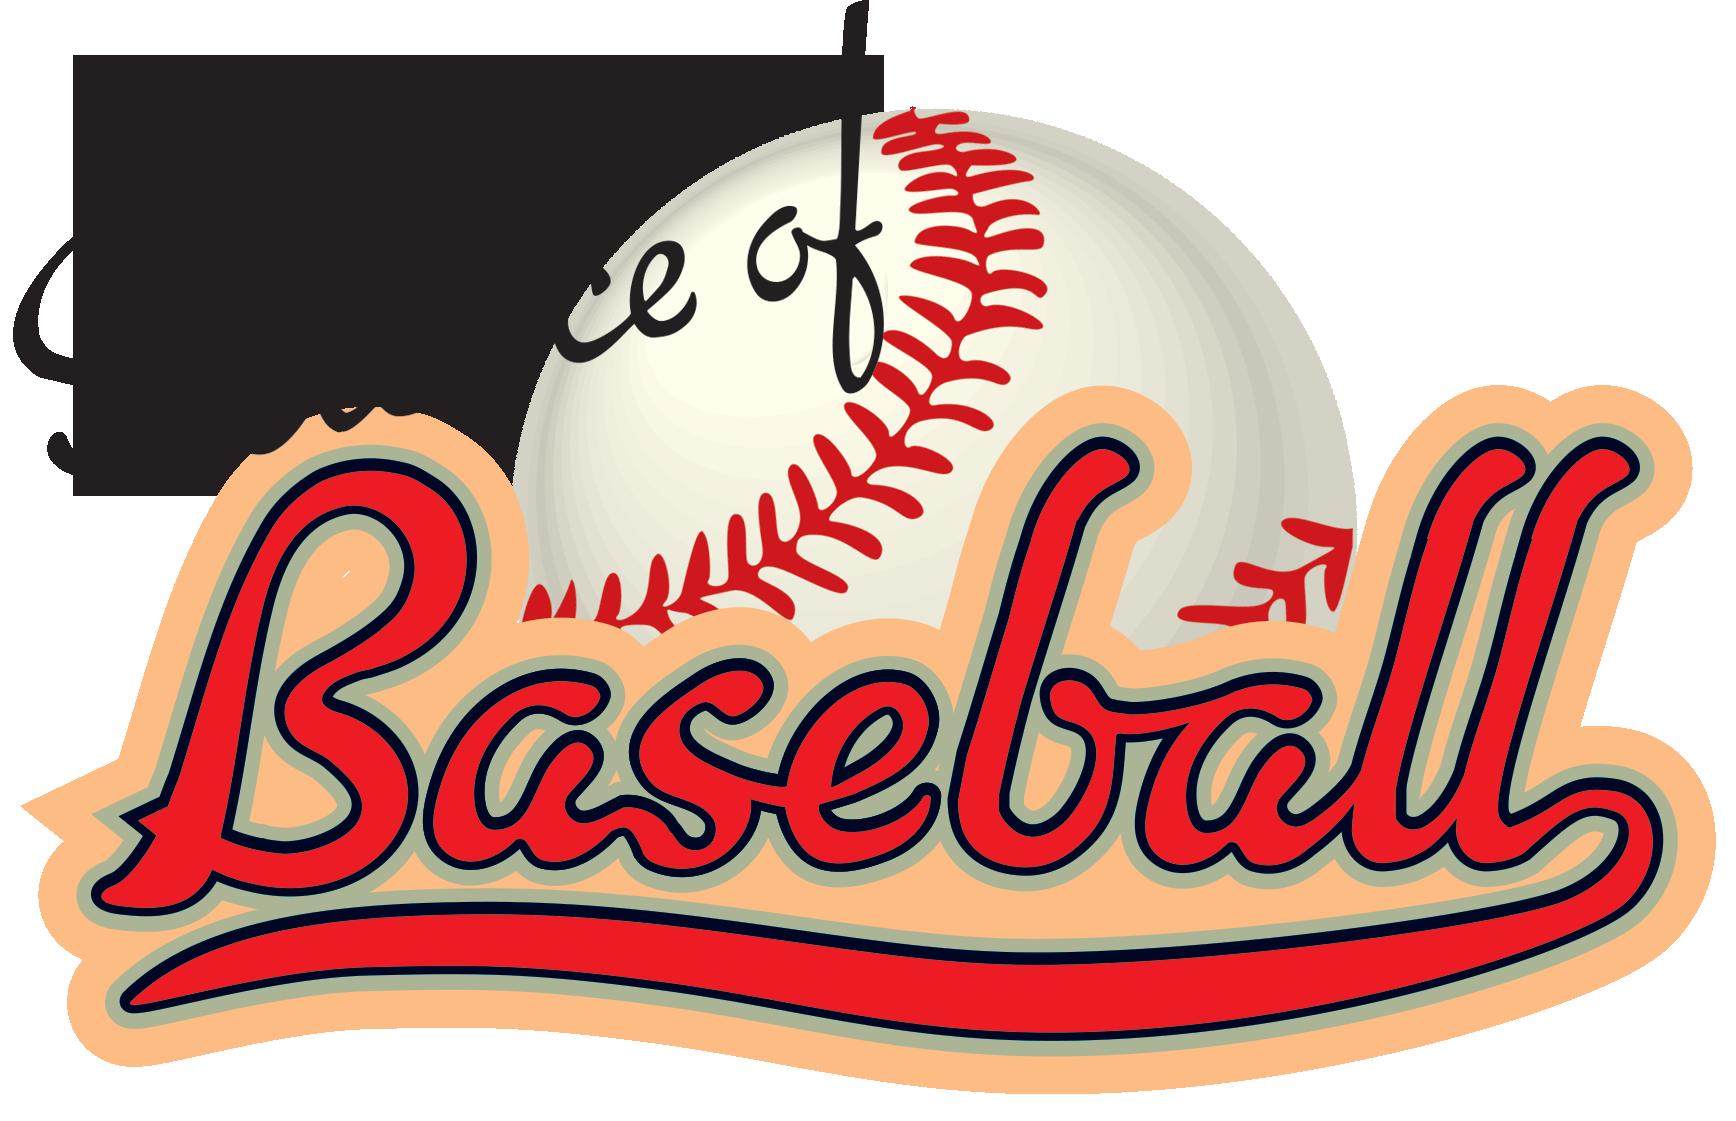 Baseball ball breaking glass clipart clipart free download Science of Baseball clipart free download